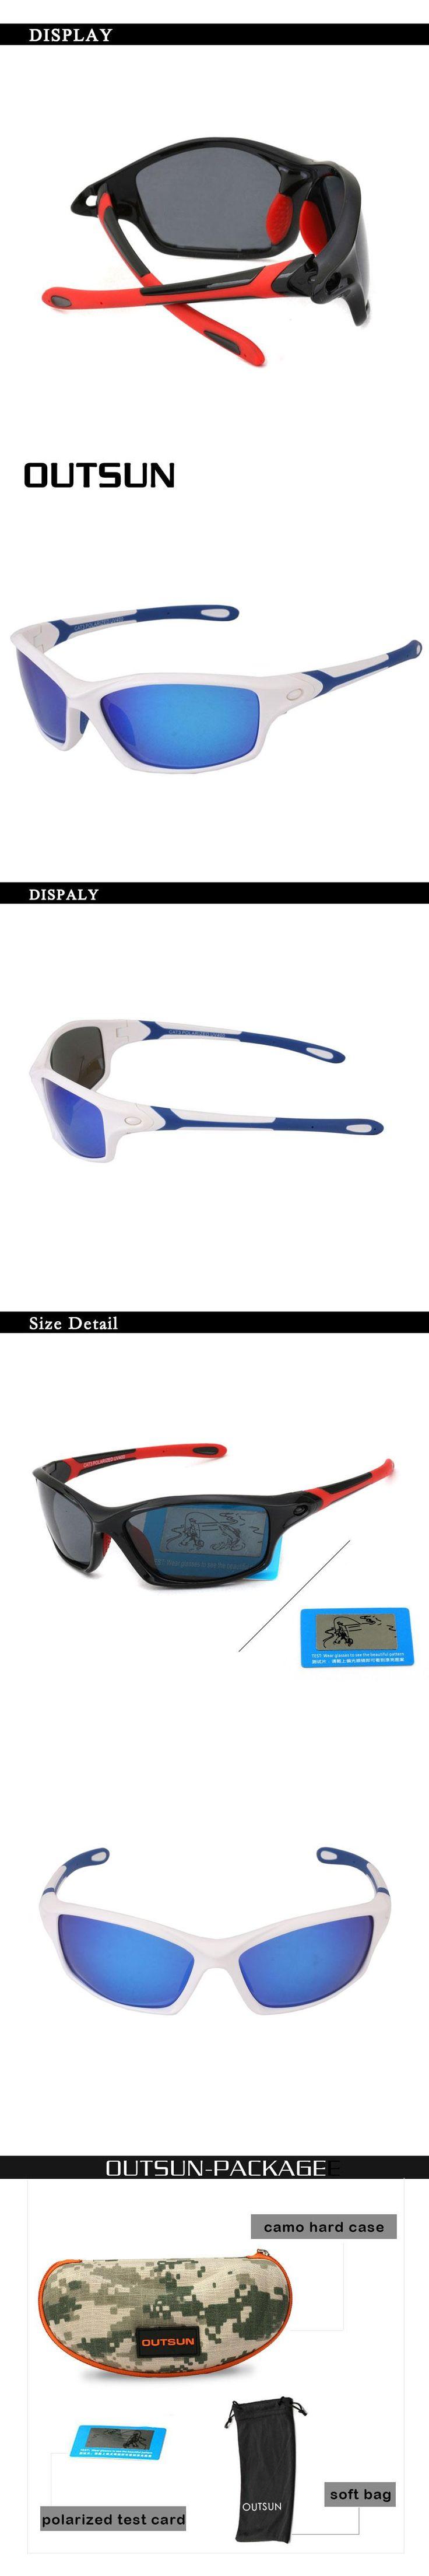 OUTSUN Men Polarized Sunglasses Men Eyewear TR90 glasses for men Sun protection Sport Sunglasses Oculos De Sol